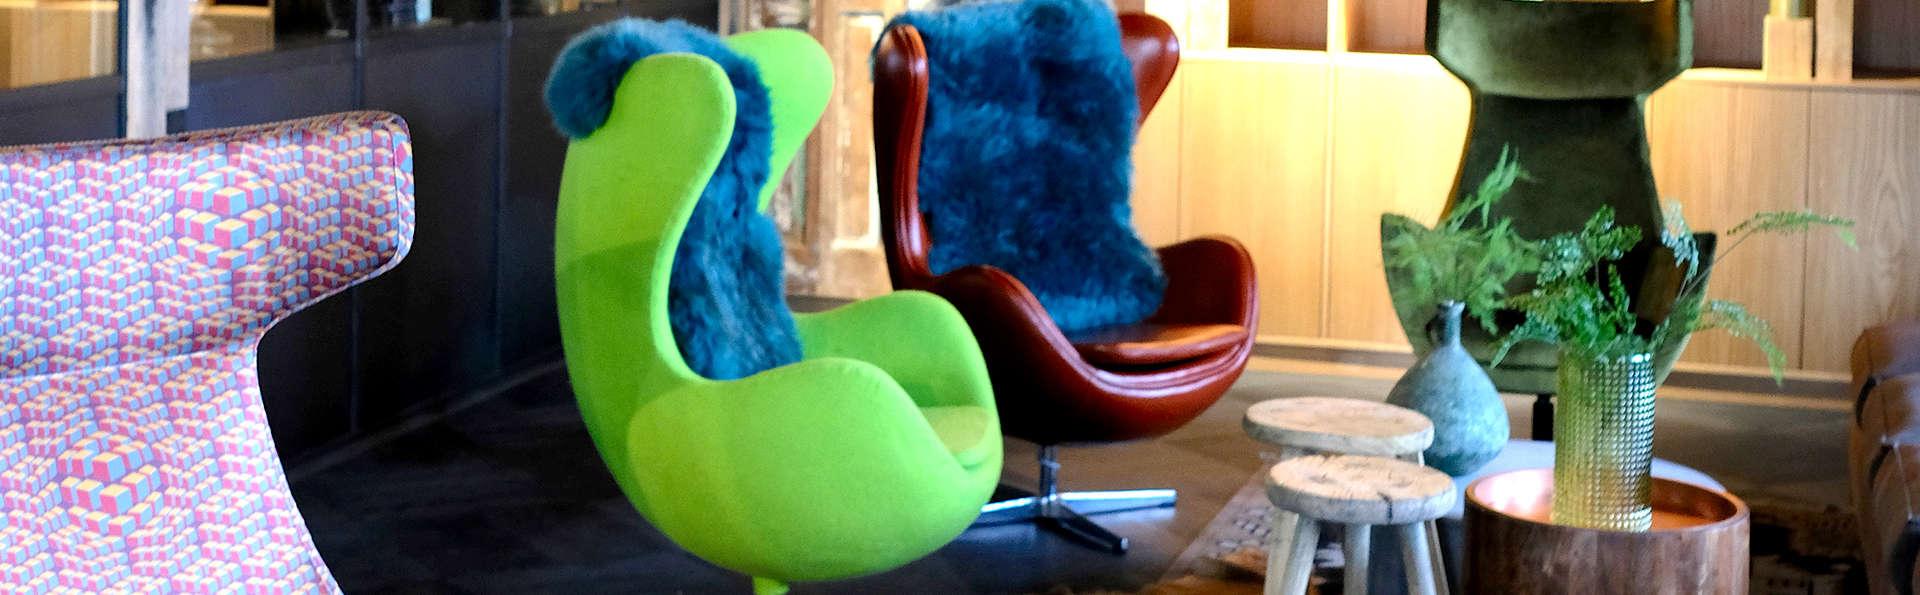 Apollo Hotel Vinkeveen-Amsterdam - Edit_Lobby.jpg